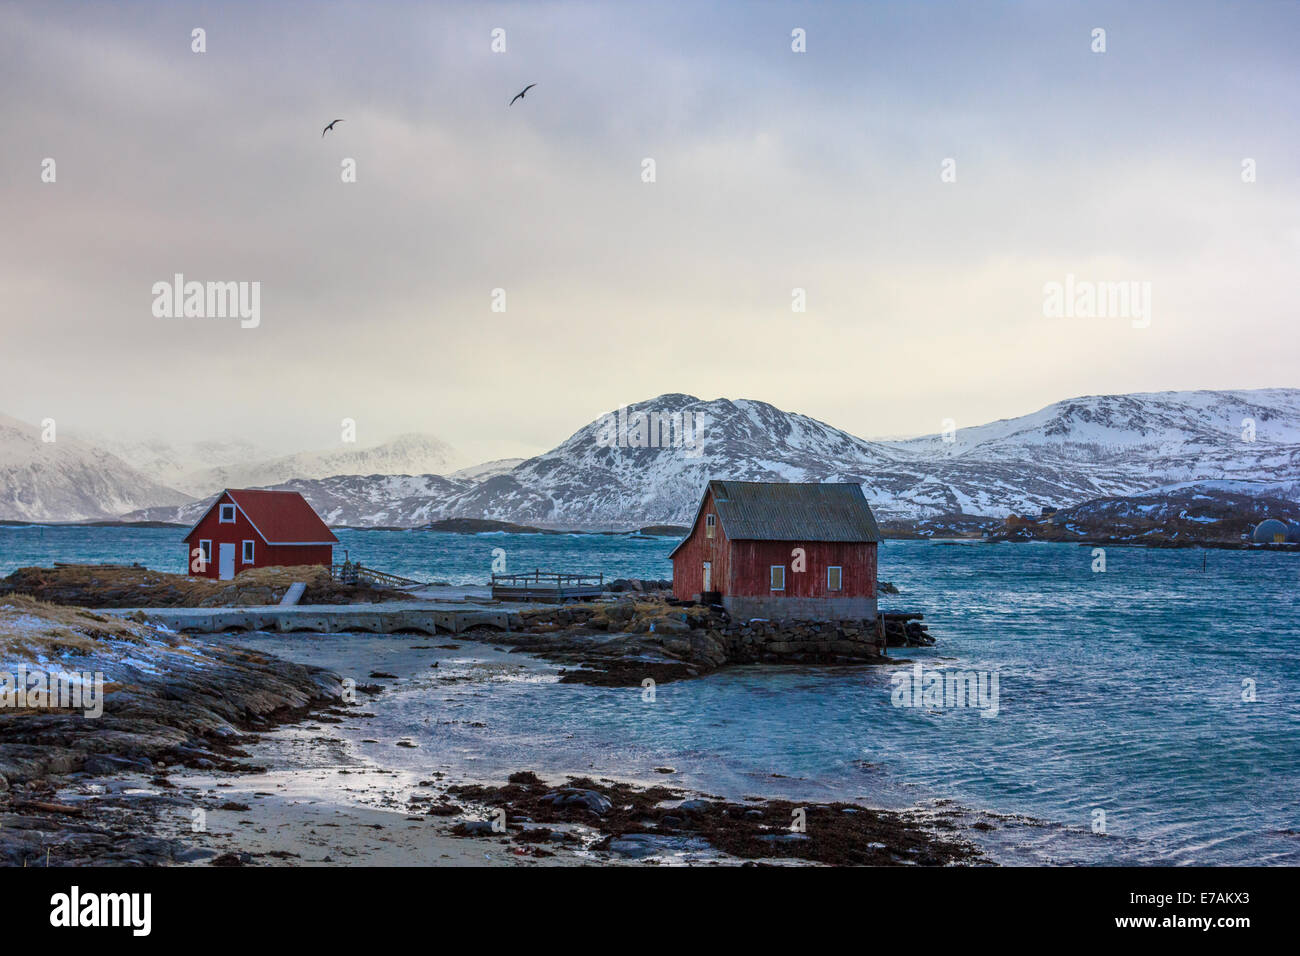 Traditional rorbu in Lofoten islands in Norway - Stock Image